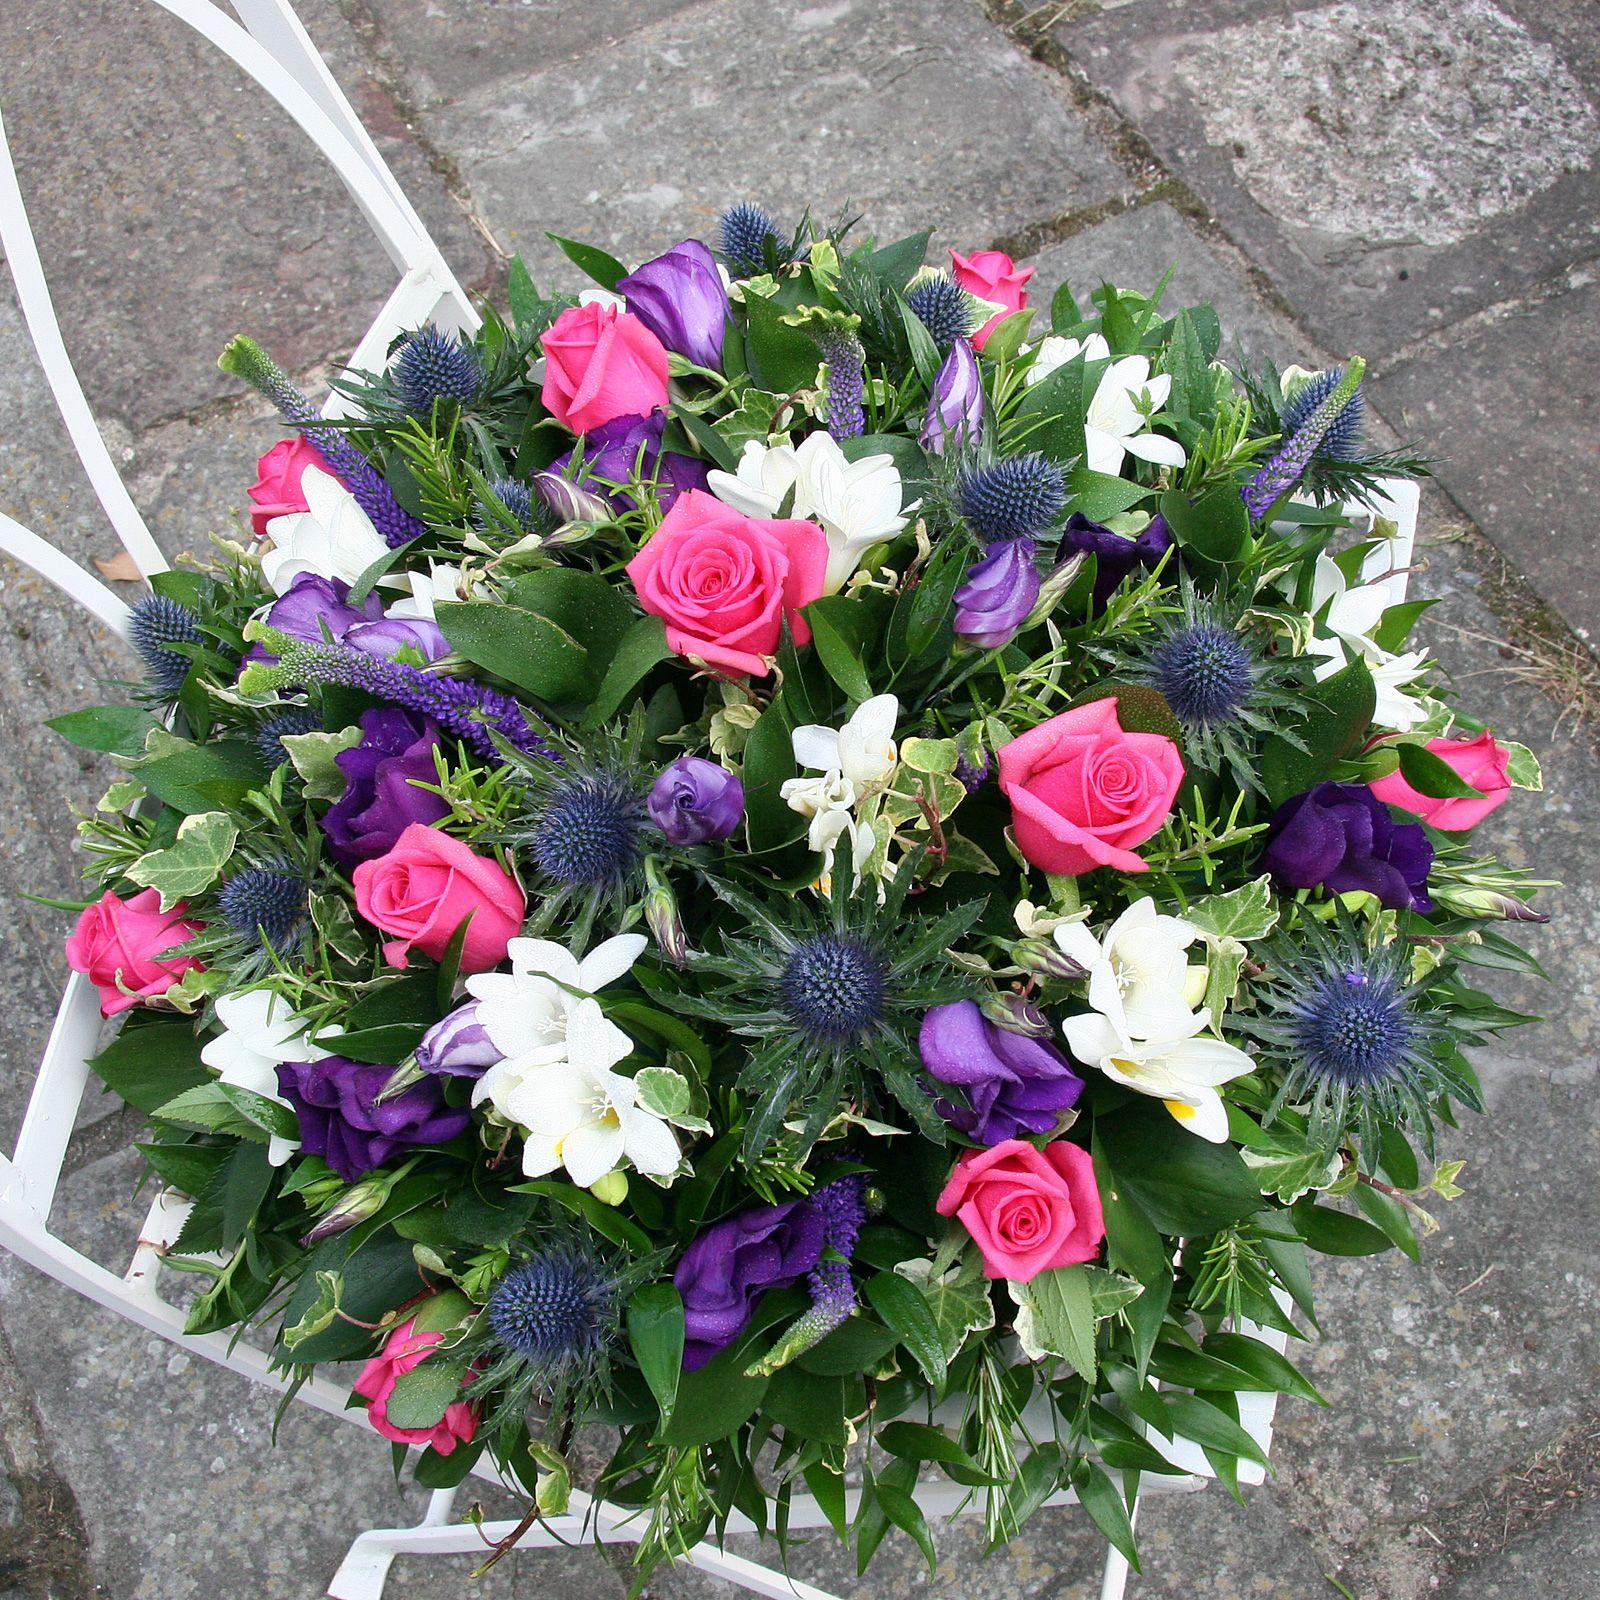 Funeral flowers - funeral wreath